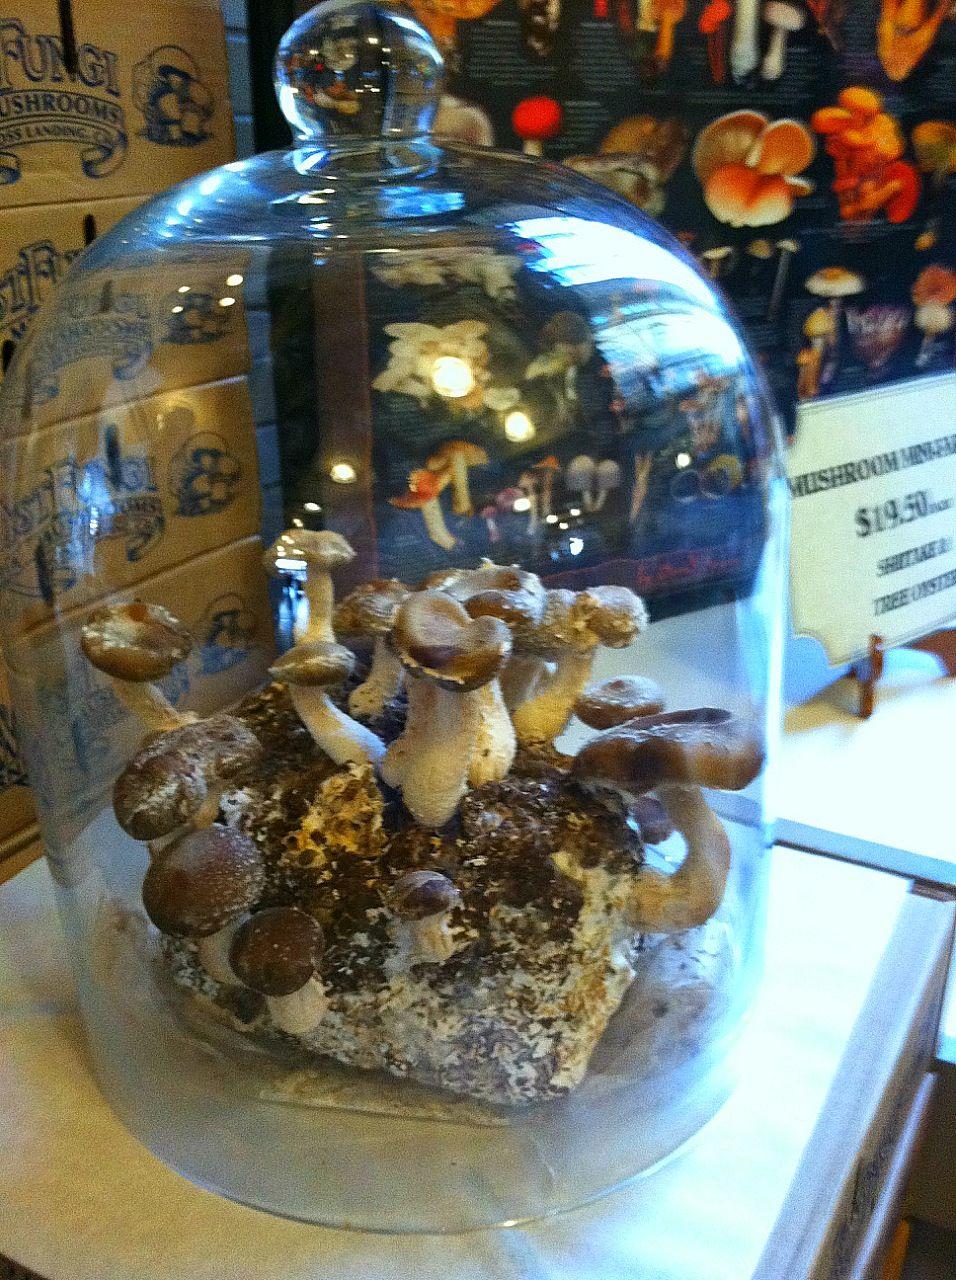 Indoor Mushroom Garden Indoor mushroom farm gardening flowers and plants pinterest indoor mushroom farm workwithnaturefo